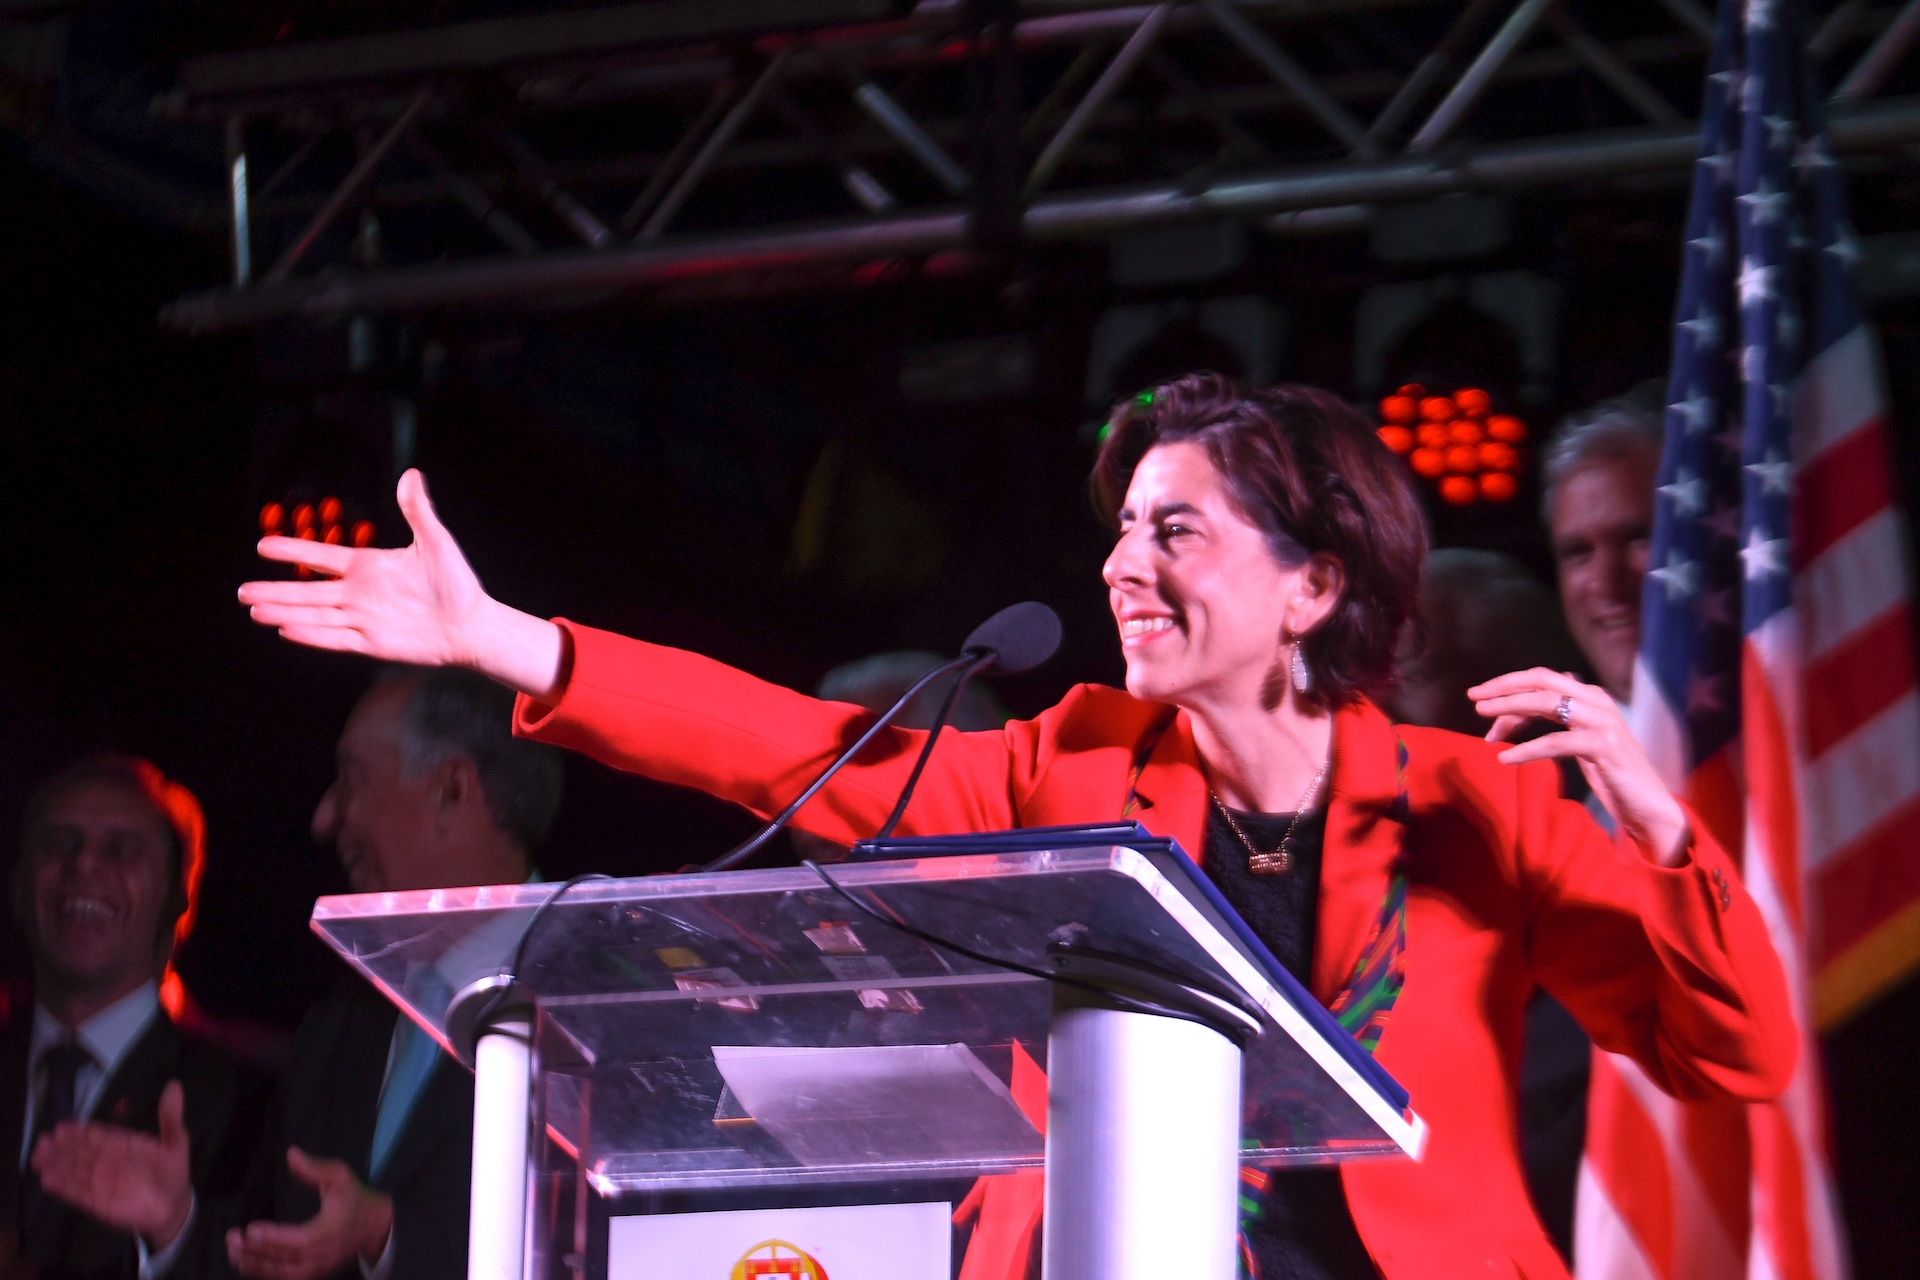 rhode-island-governor-gina-raimondo-addresses-the-crowd-in-the-alex-and-ani-city-center_41893860375_